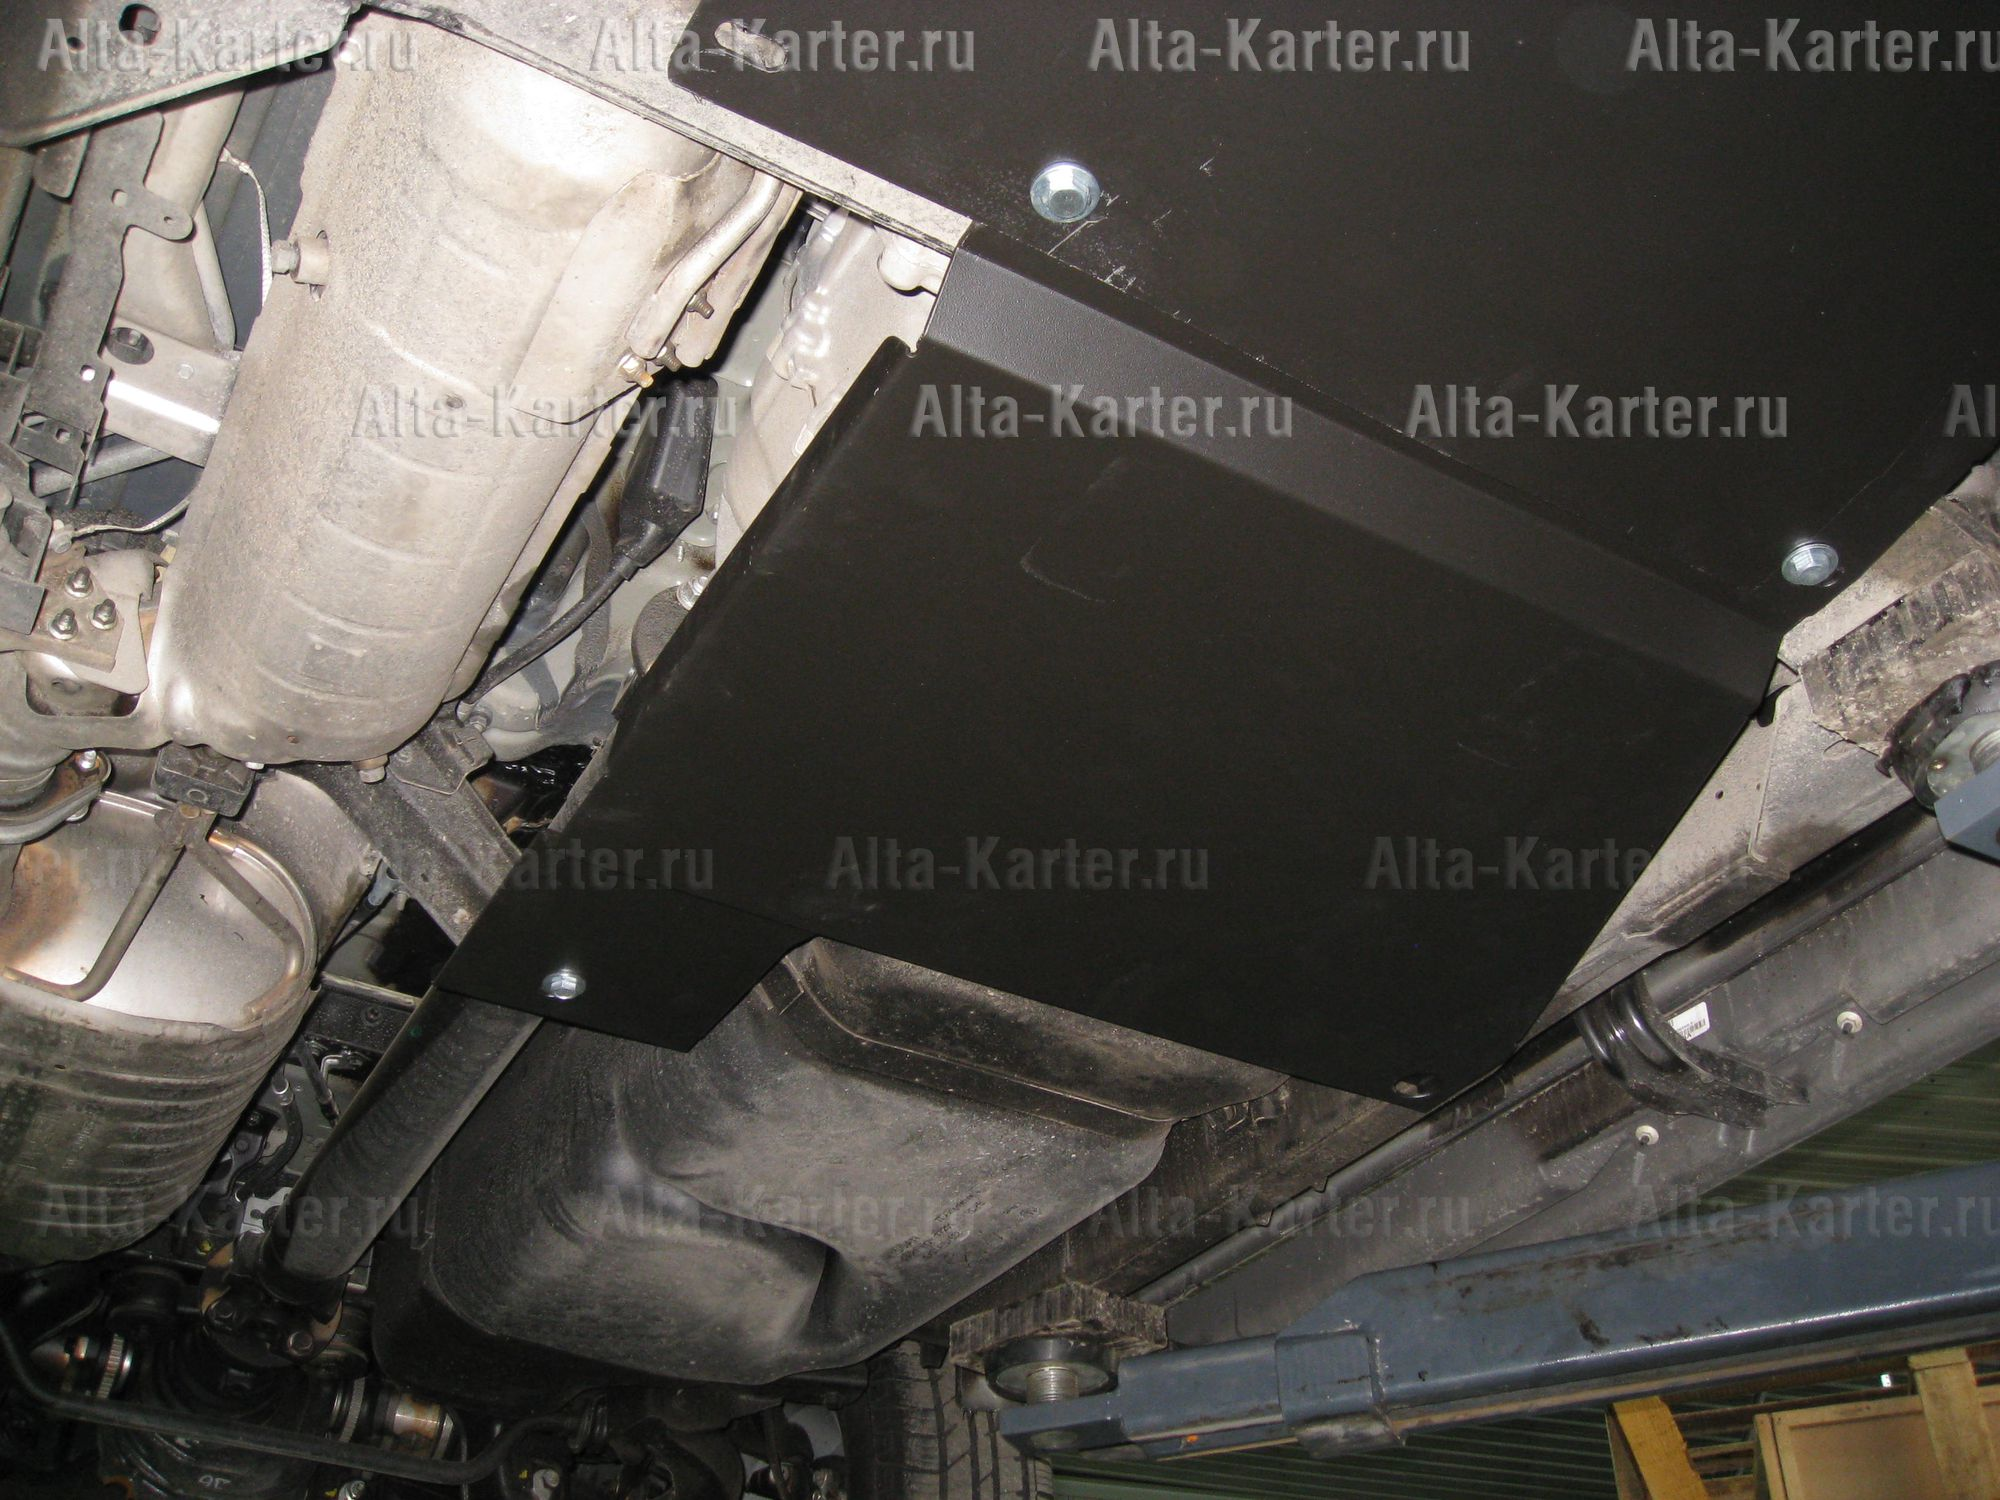 Защита Alfeco для раздатки Nissan Pathfinder R51 2004-2014. Артикул ALF.15.10